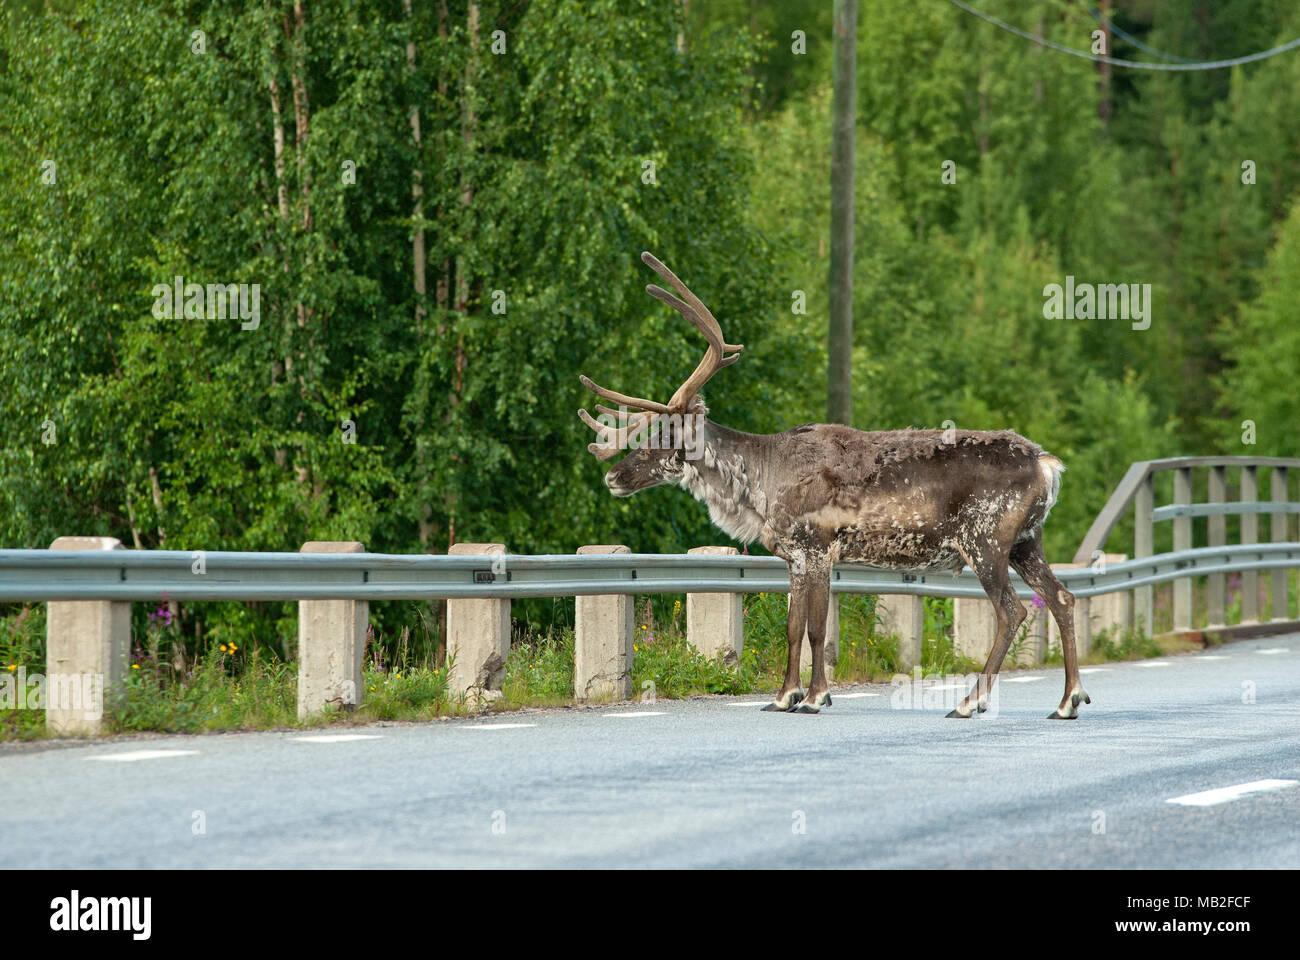 Maschio (renna Rangifer tarandus) sulla strada, Lapponia, Svezia Immagini Stock